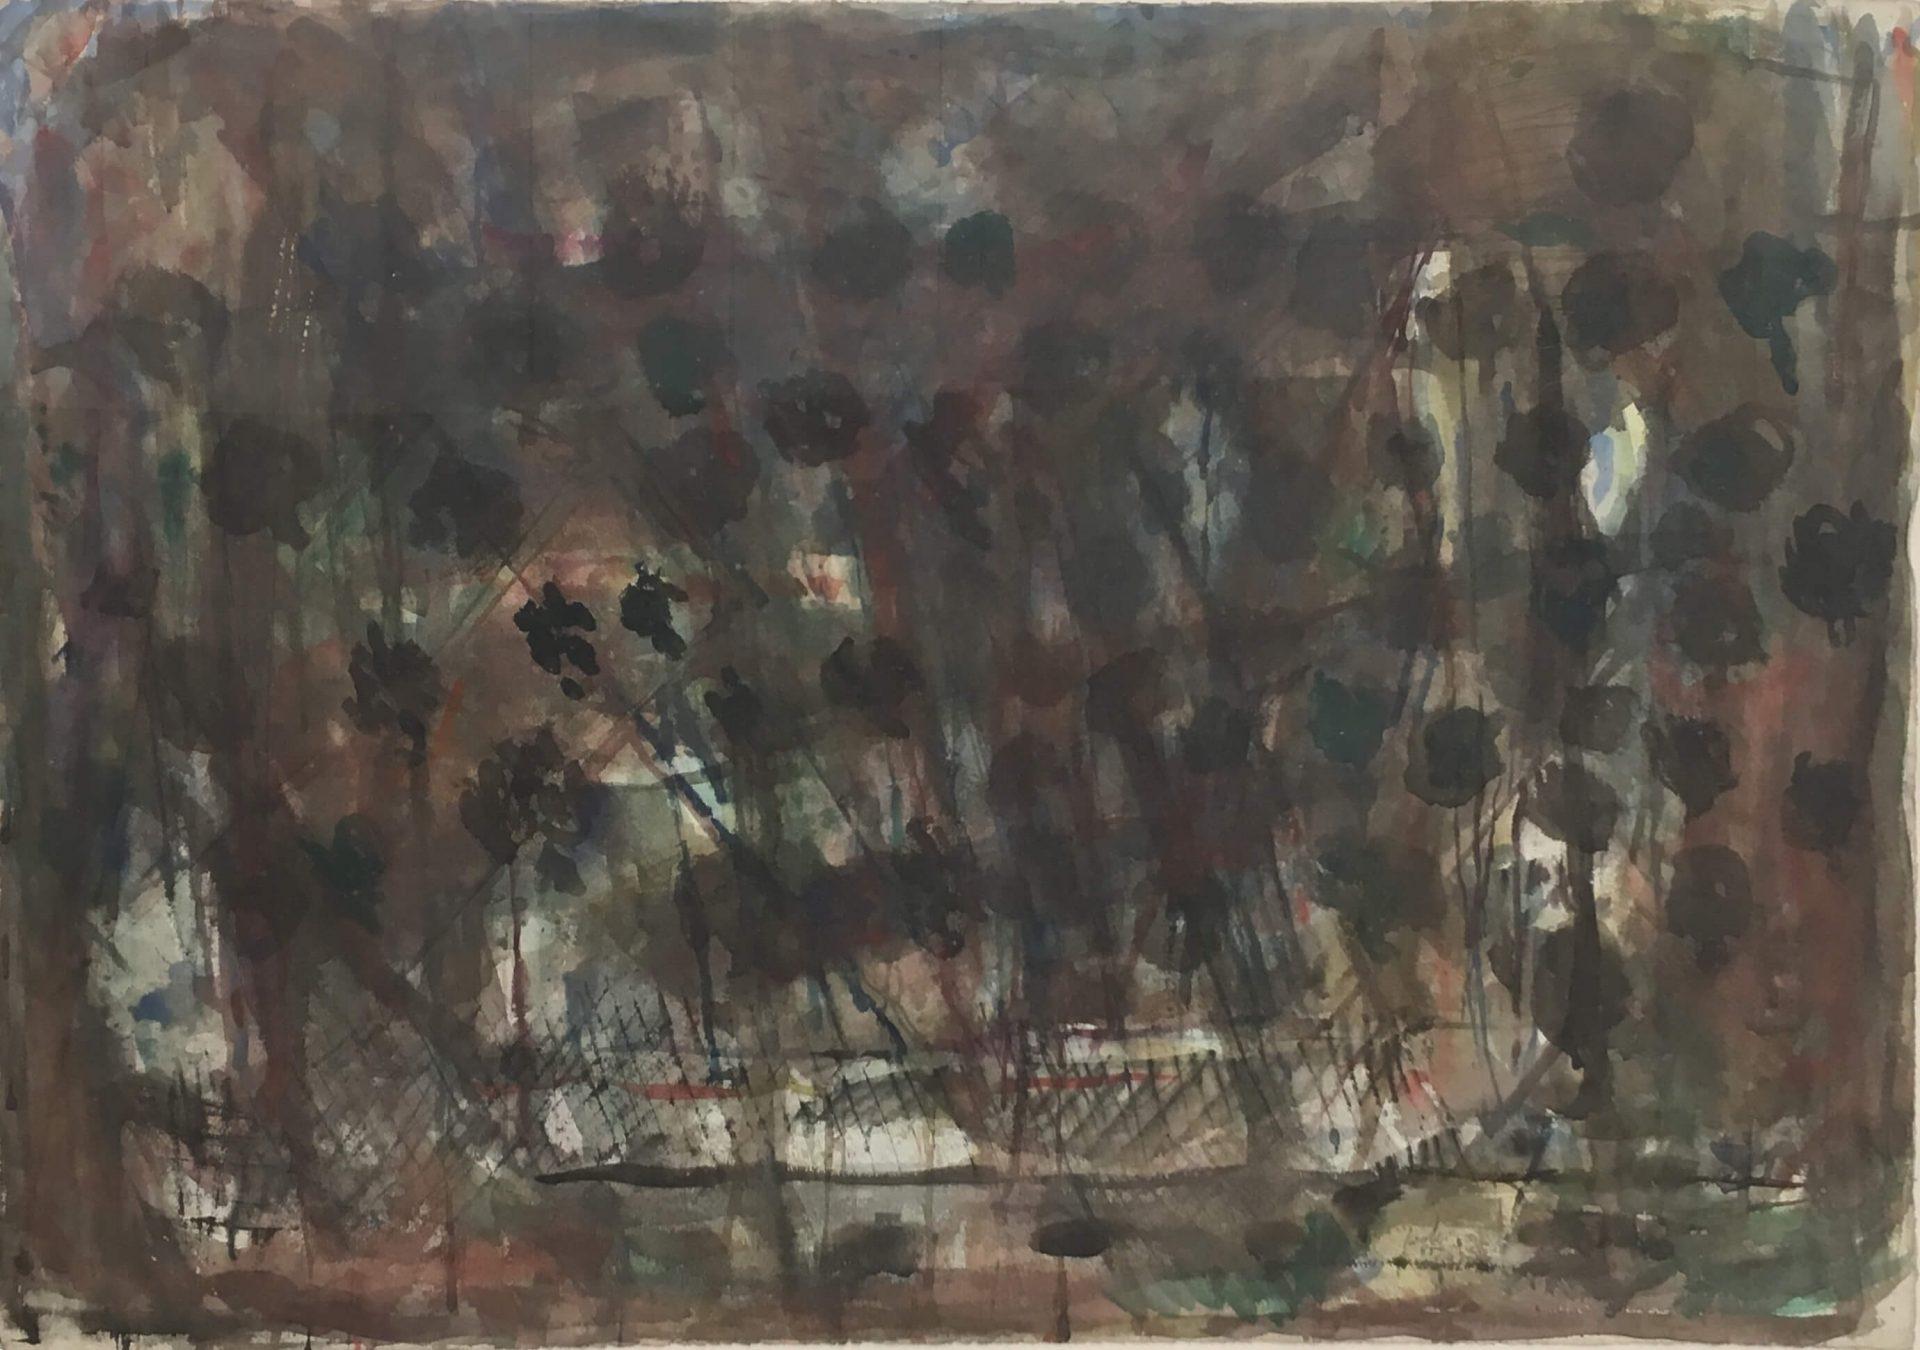 1466_Yehezkel Streichman, 1985, Mixed media, 76x113 cm-2760x1940